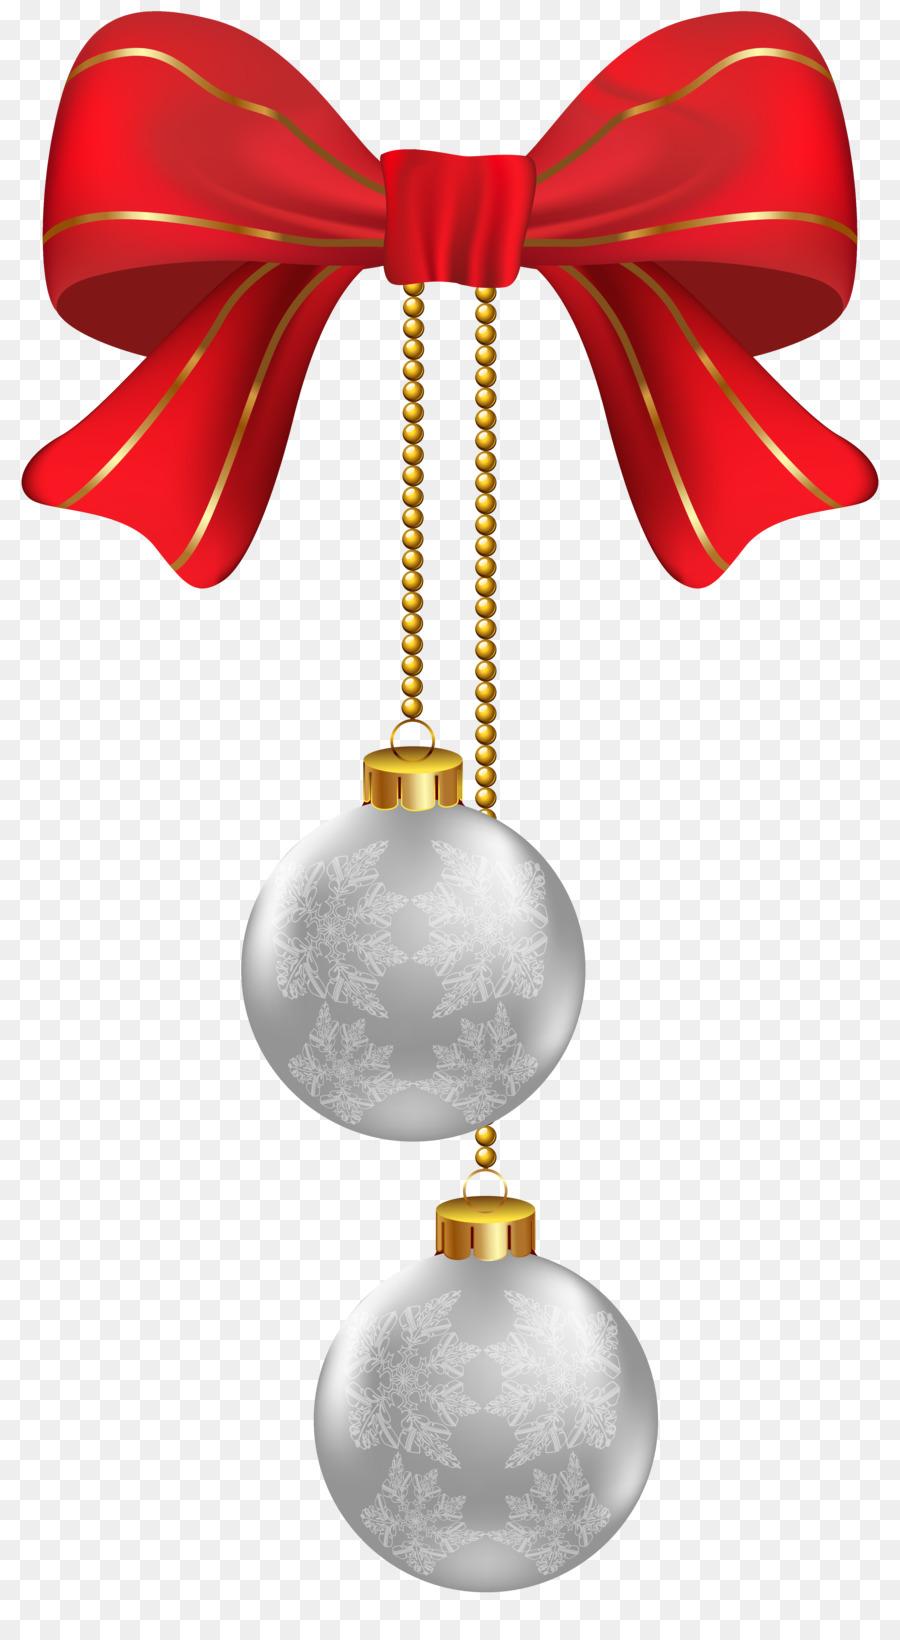 Wedding invitation Christmas ornament Clip art - decorations png ...